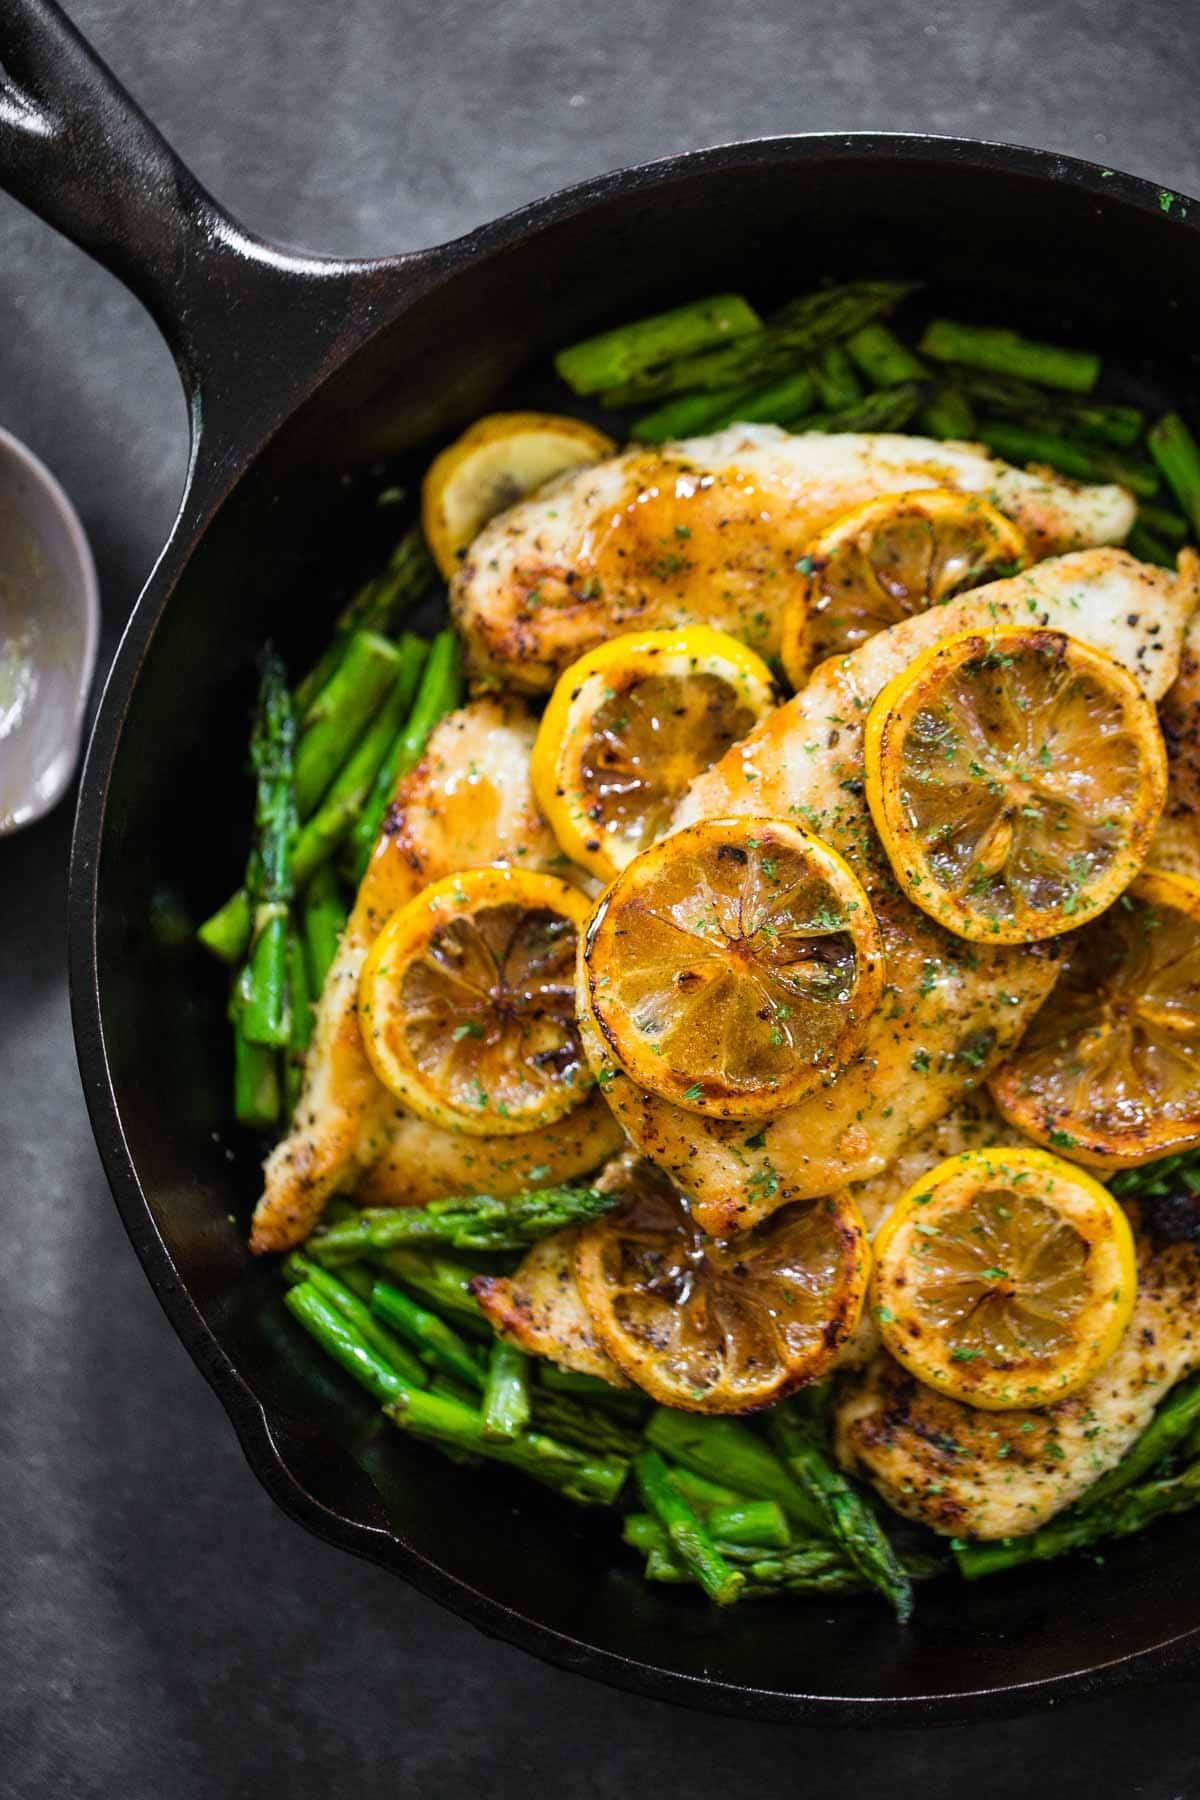 Chicken And Asparagus Recipe  5 Ingre nt Lemon Chicken with Asparagus Recipe Pinch